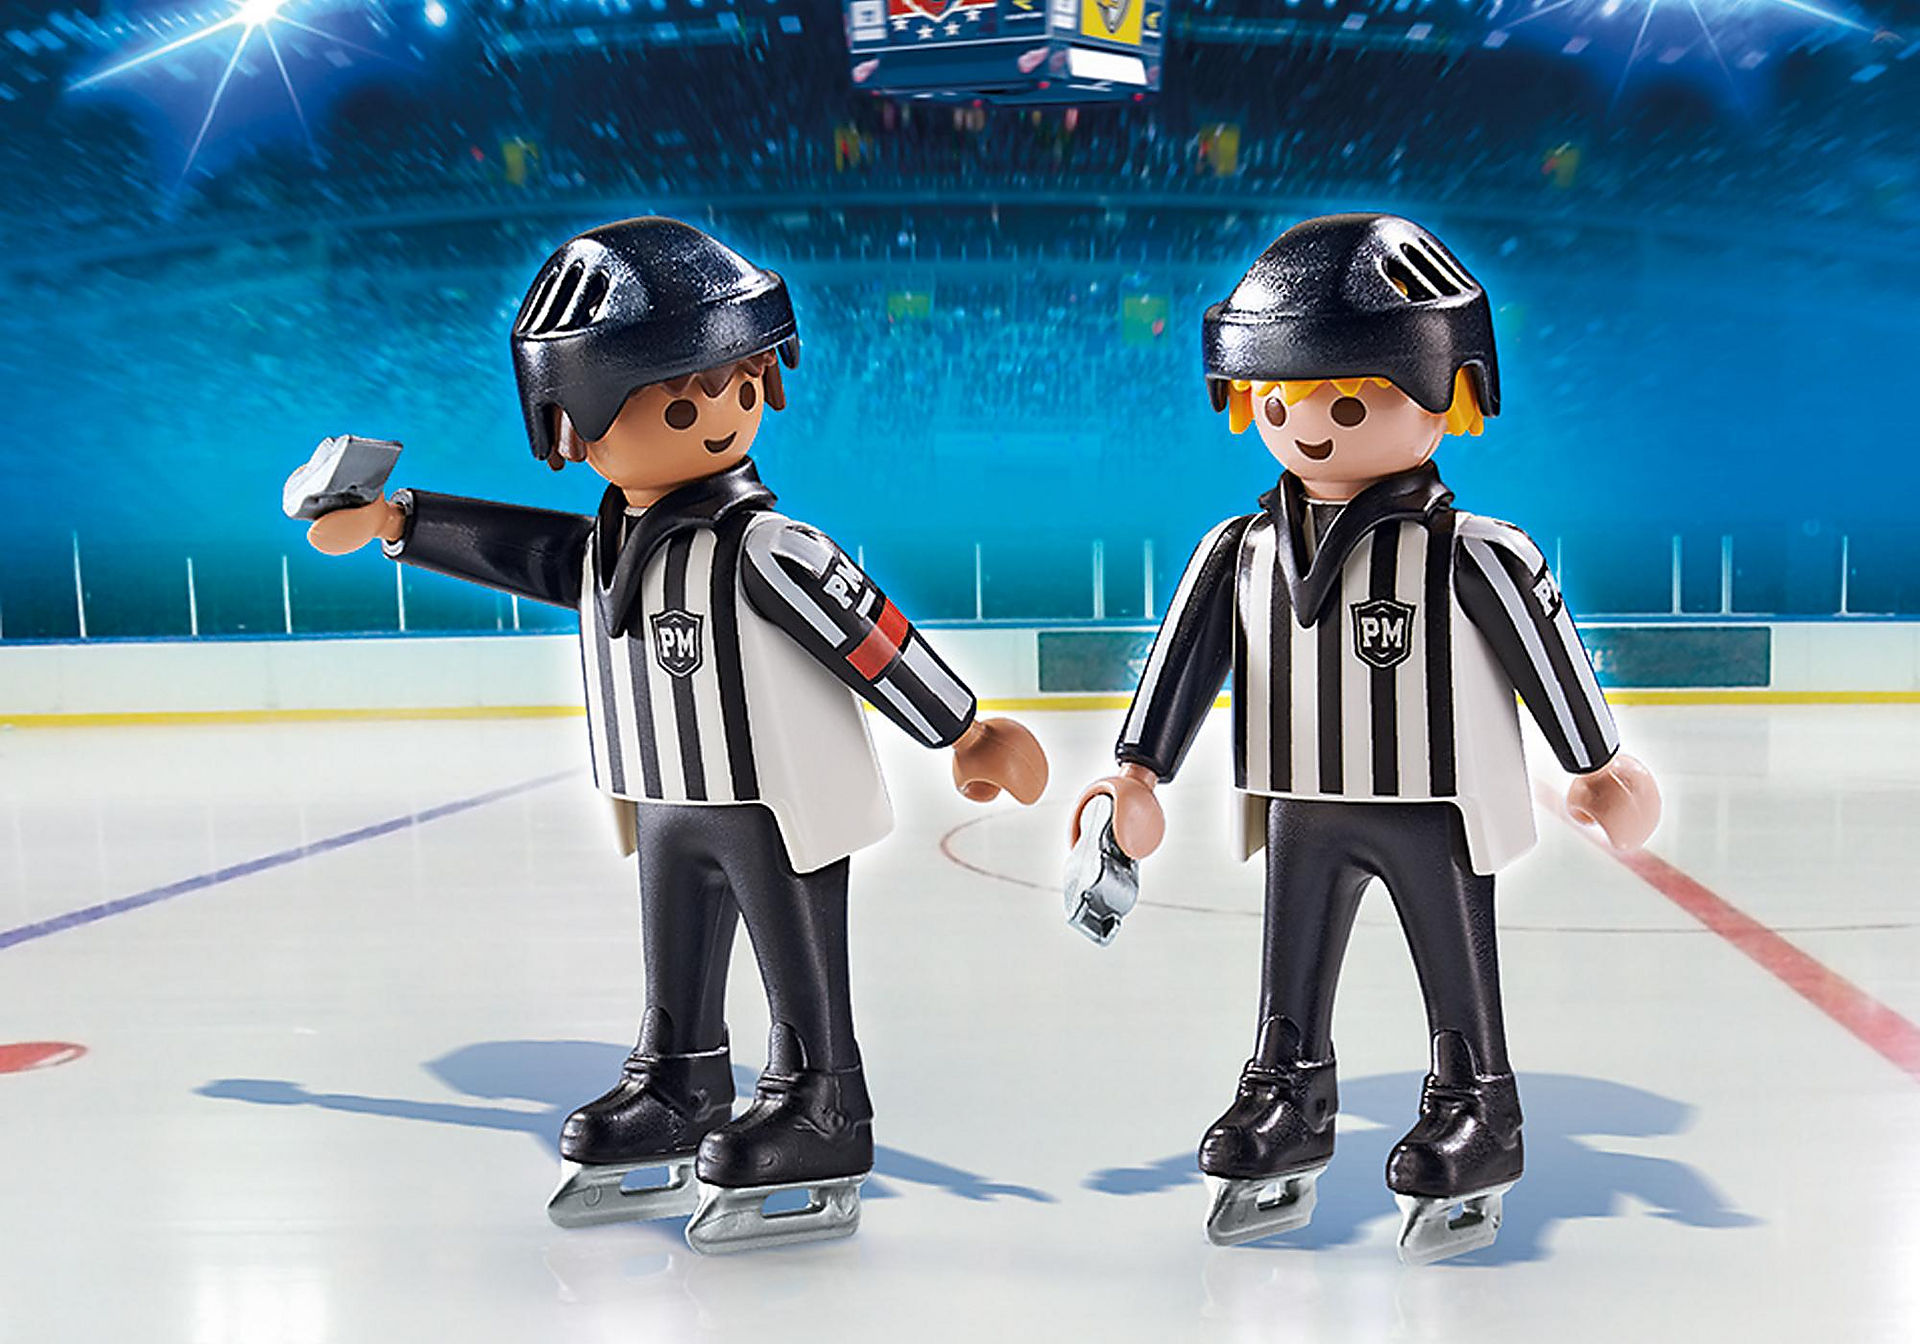 6191 Ice Hockey Referees zoom image1